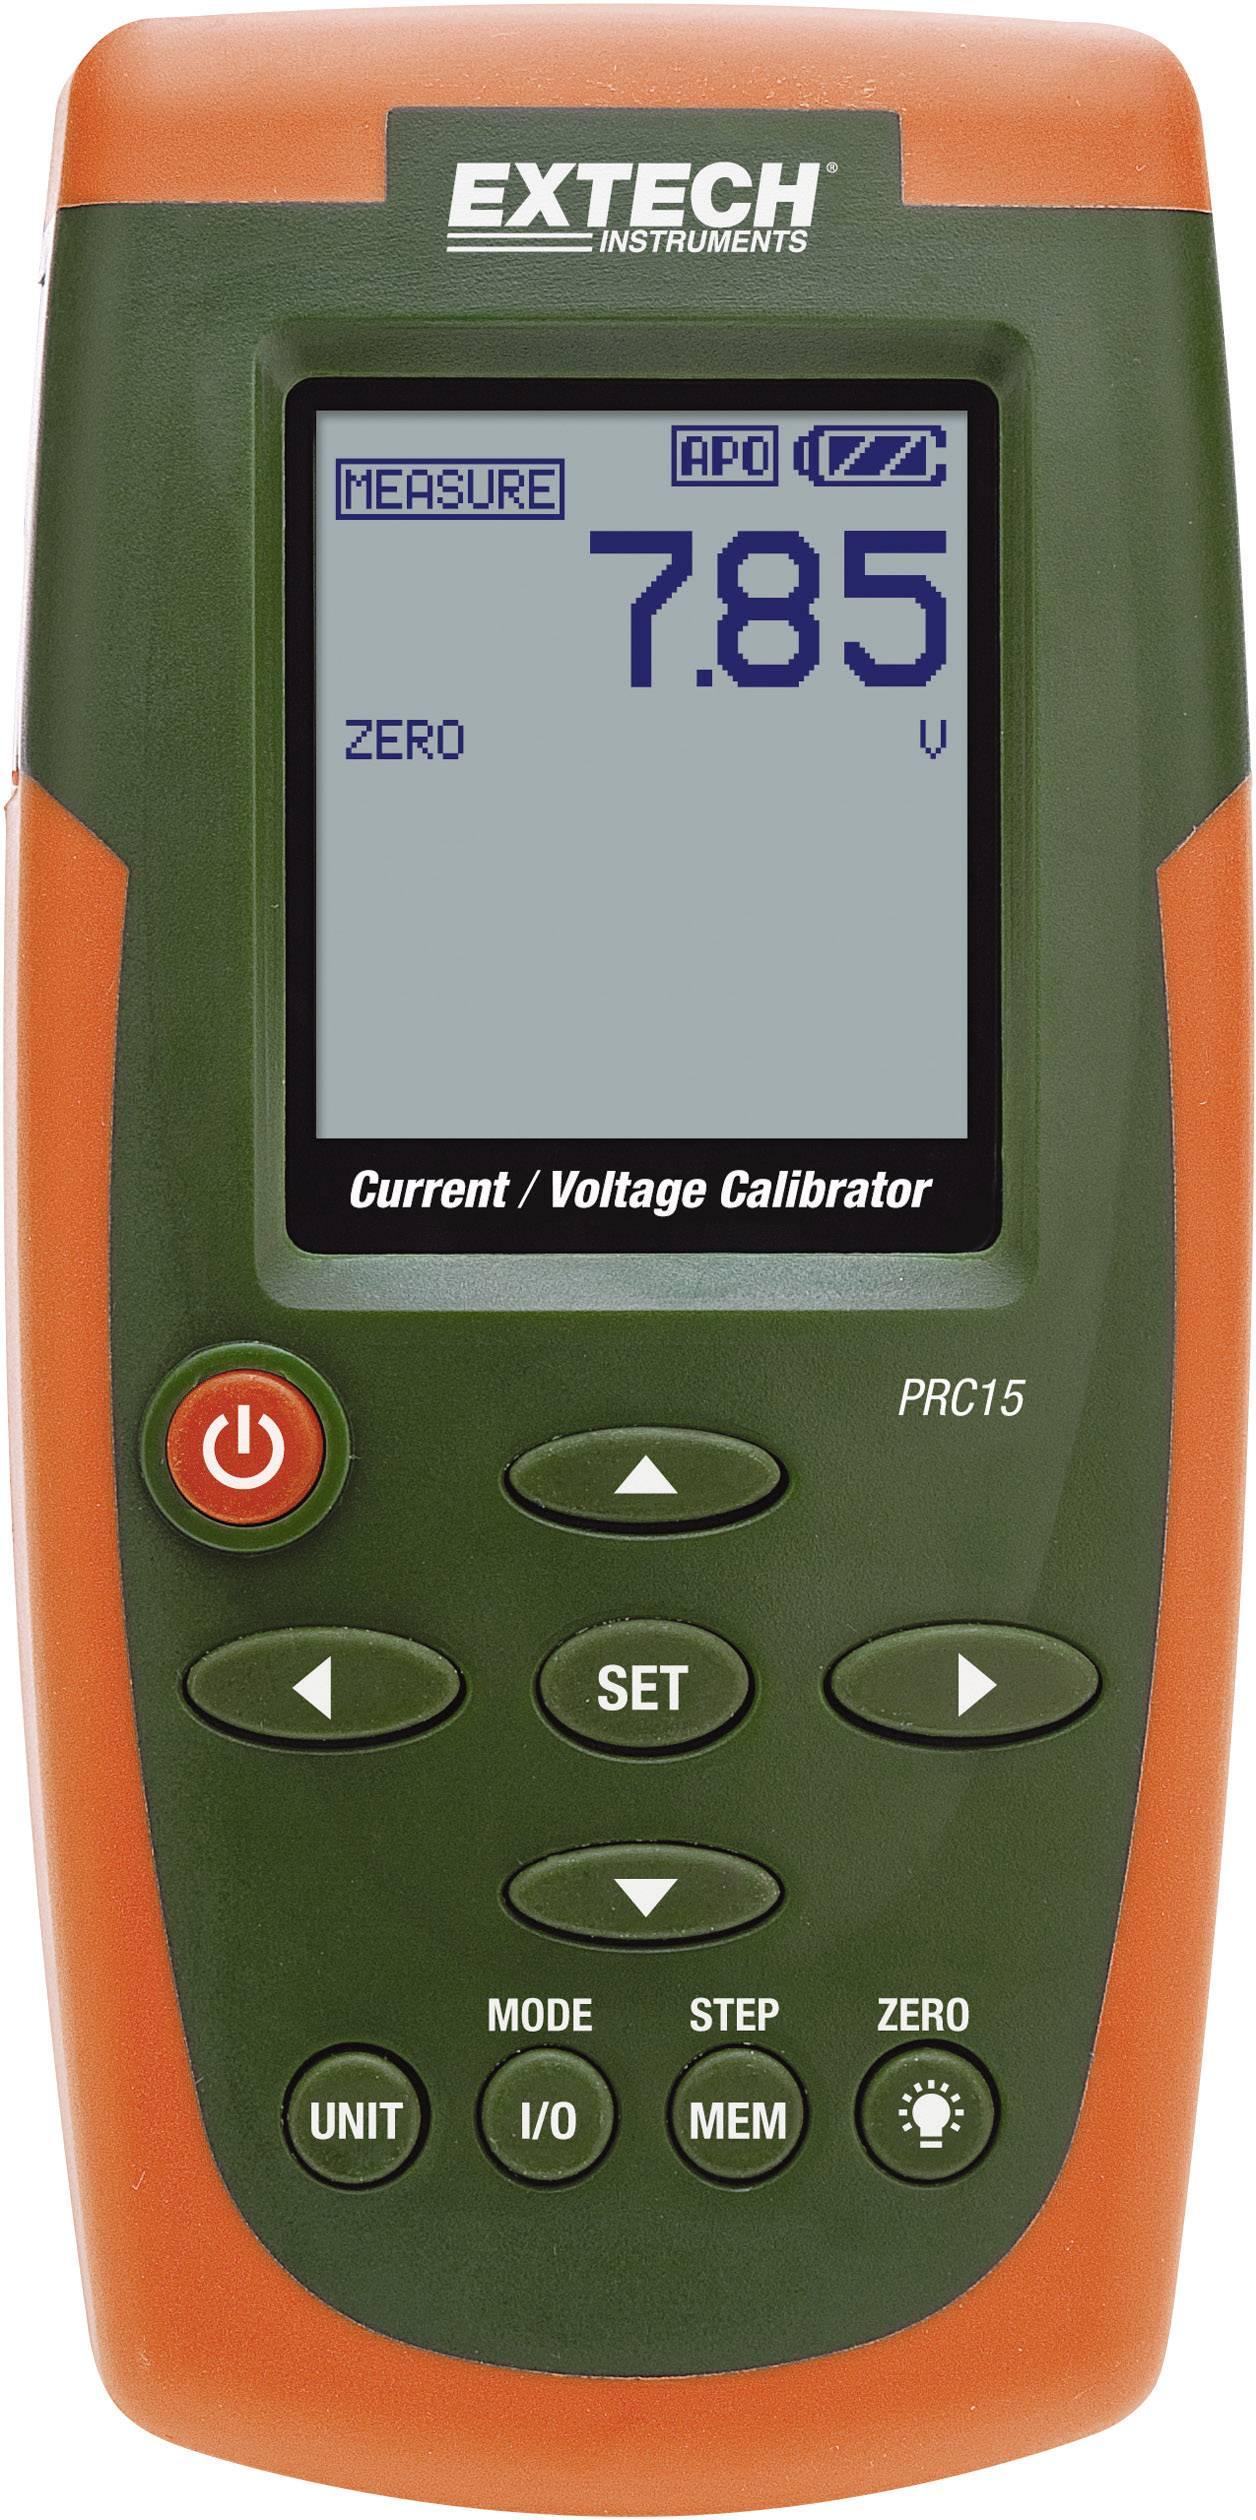 Extech PRC15 Kalibrator, Kalibrace do Kalibrováno dle ISO